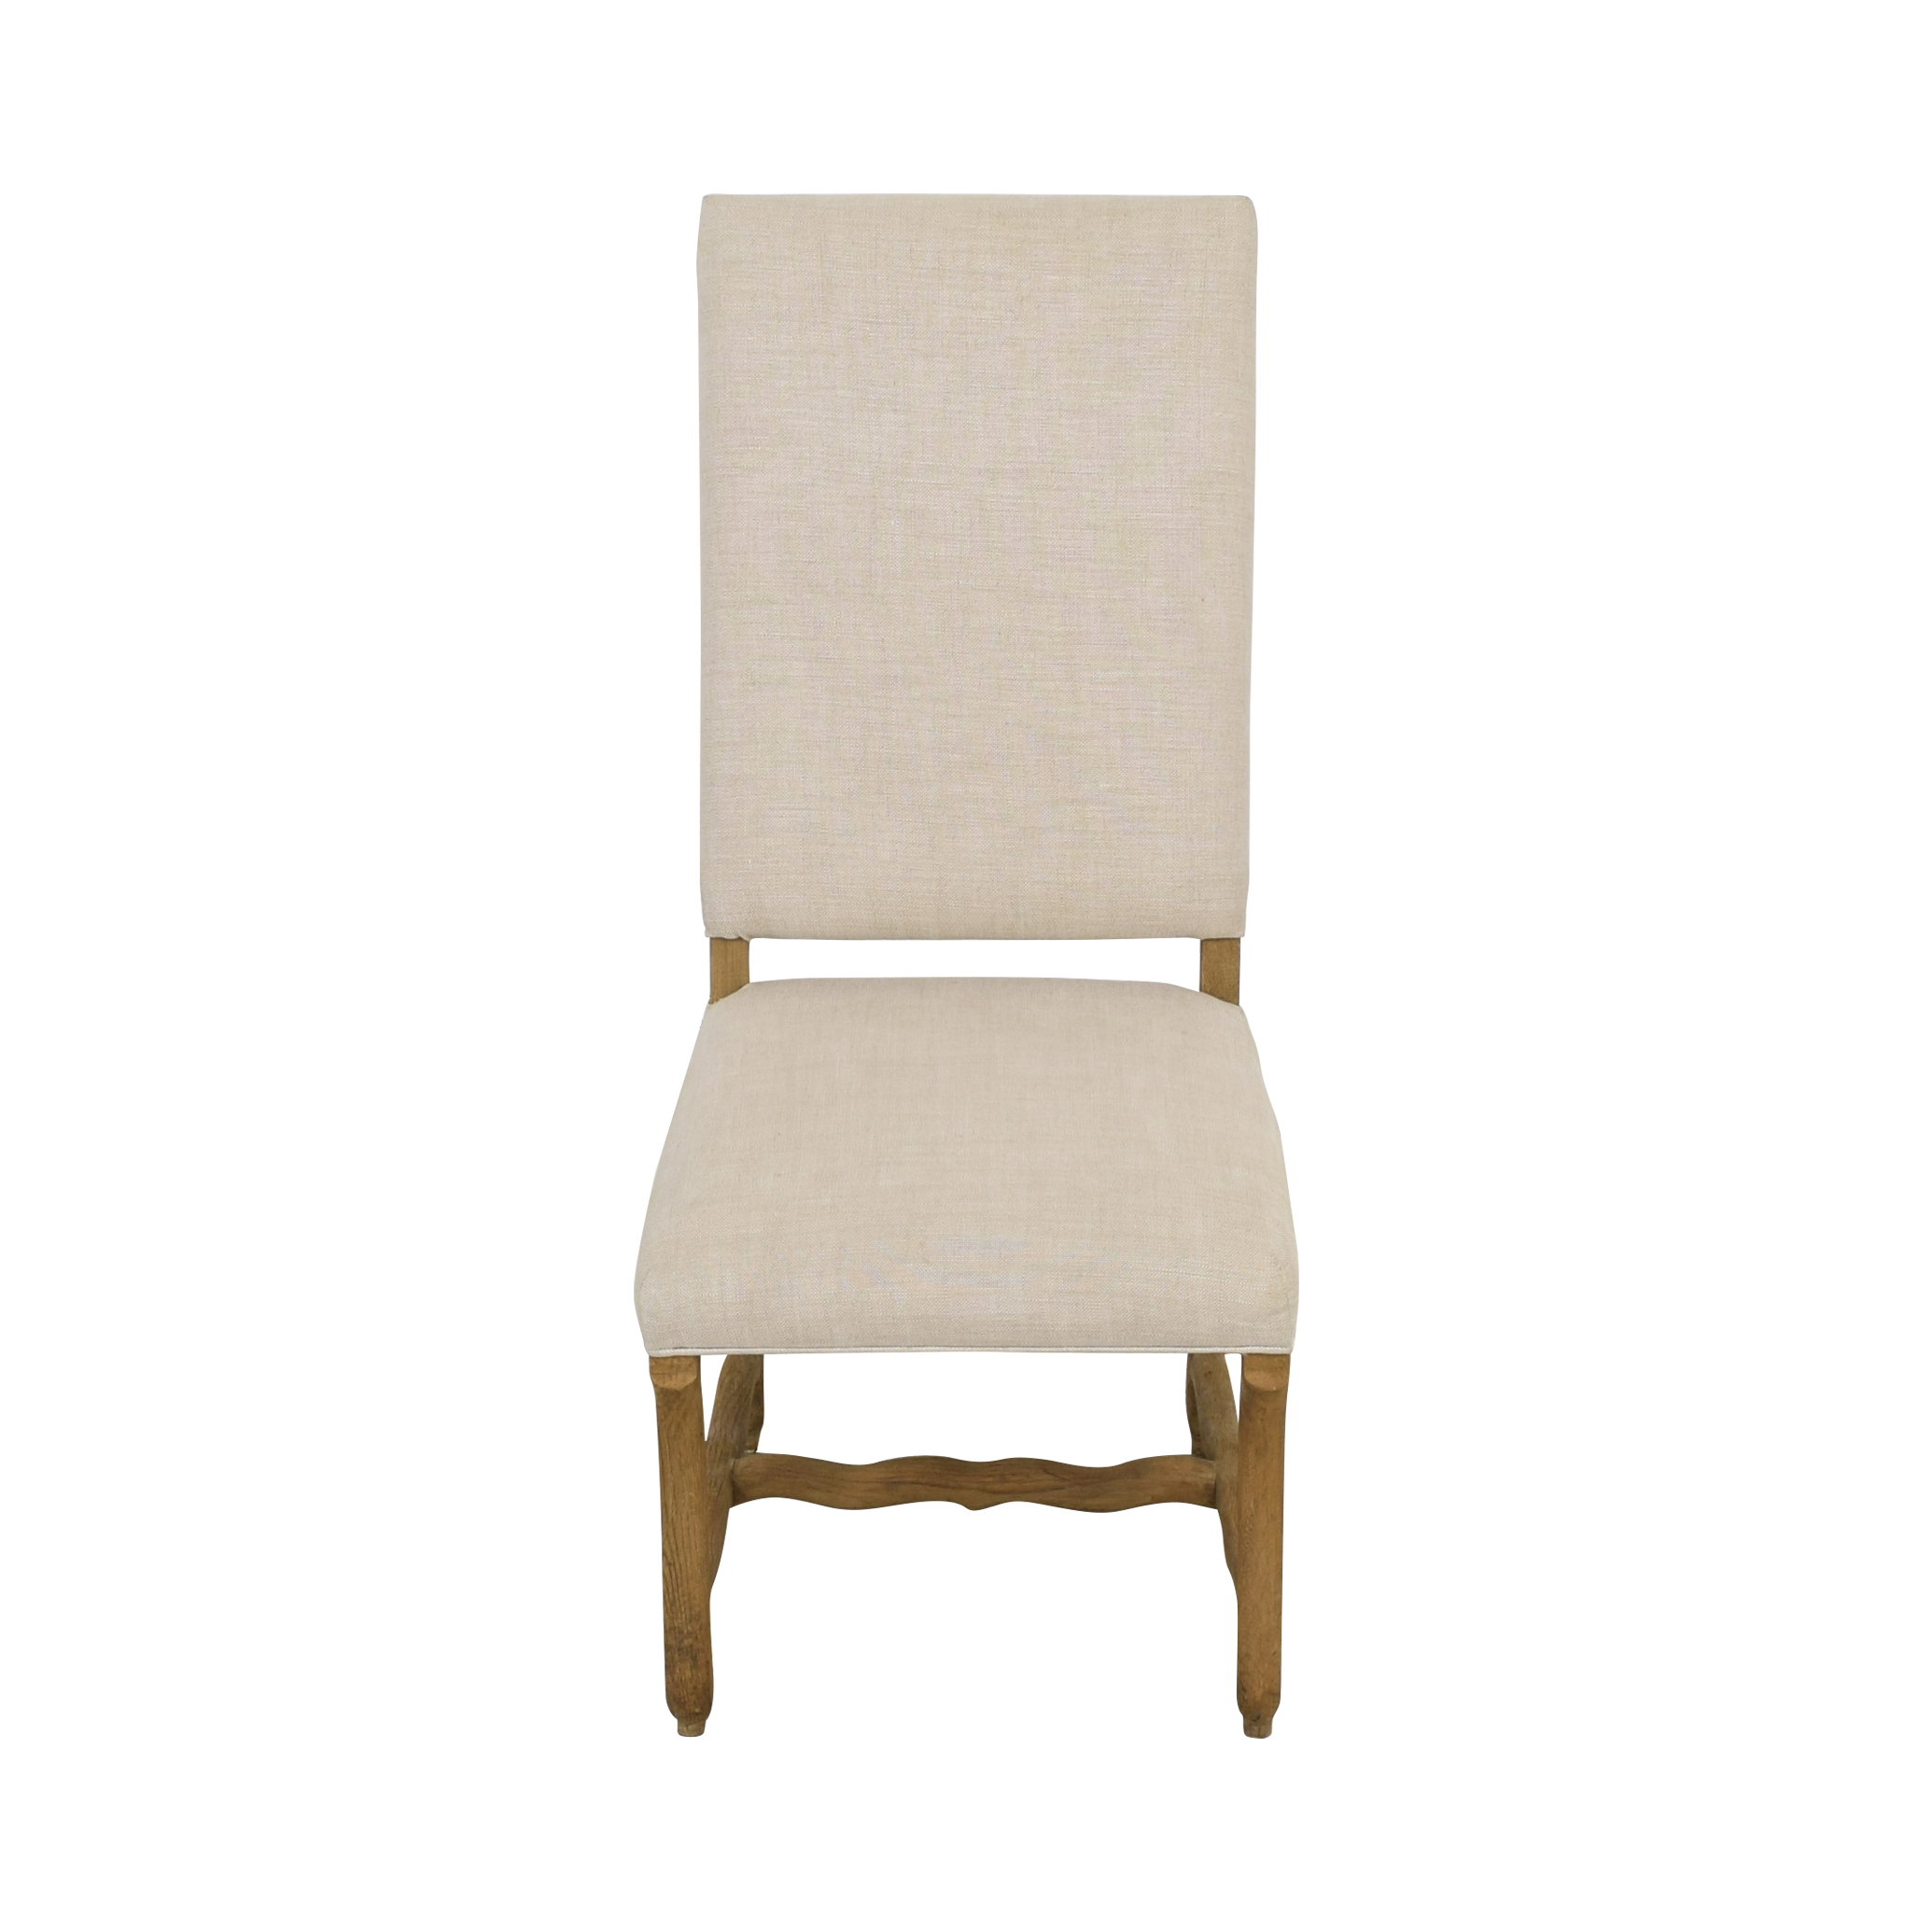 Restoration Hardware Restoration Hardware High Back Dining Chair tan